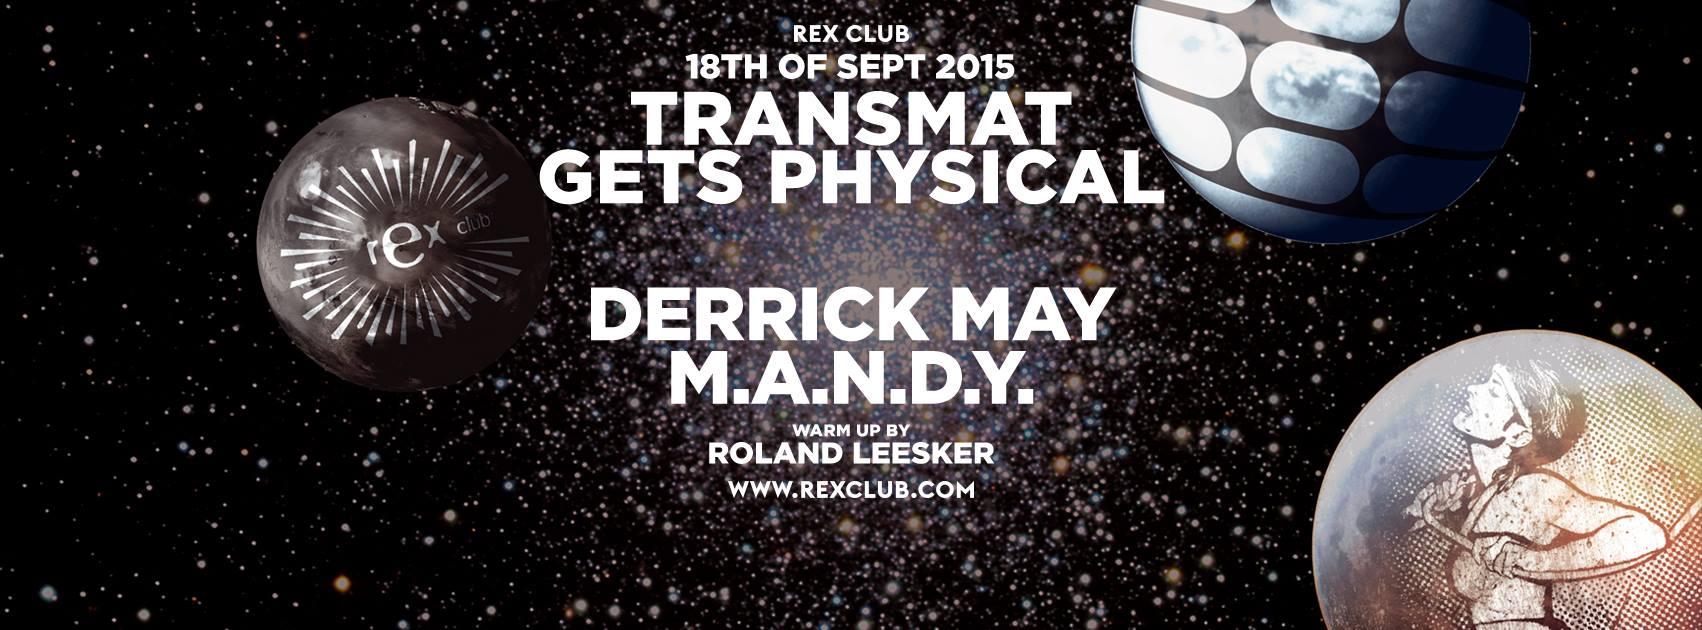 derrick may transmat